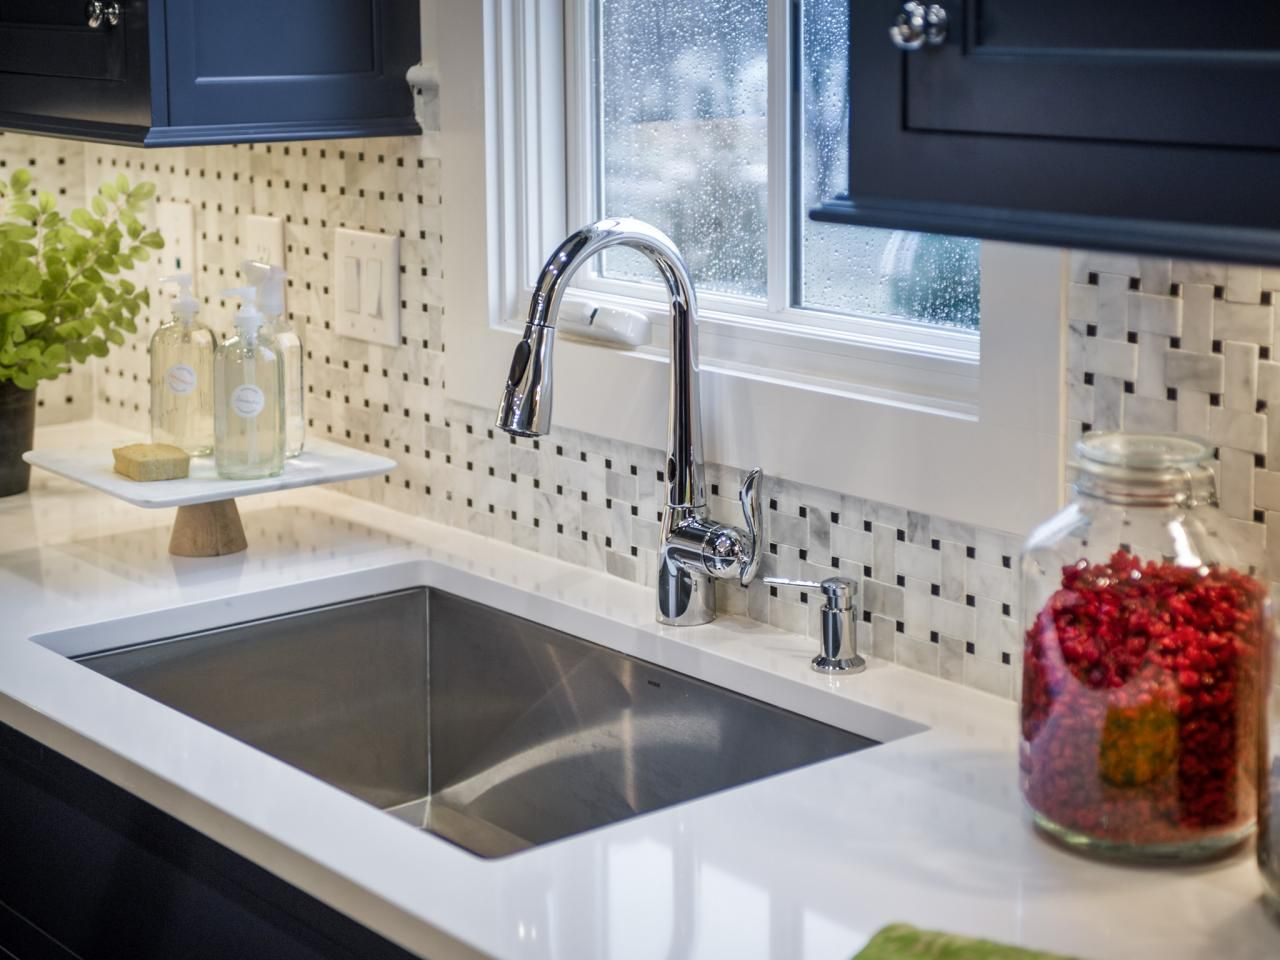 Our favorite kitchen countertop materials kitchen countertop